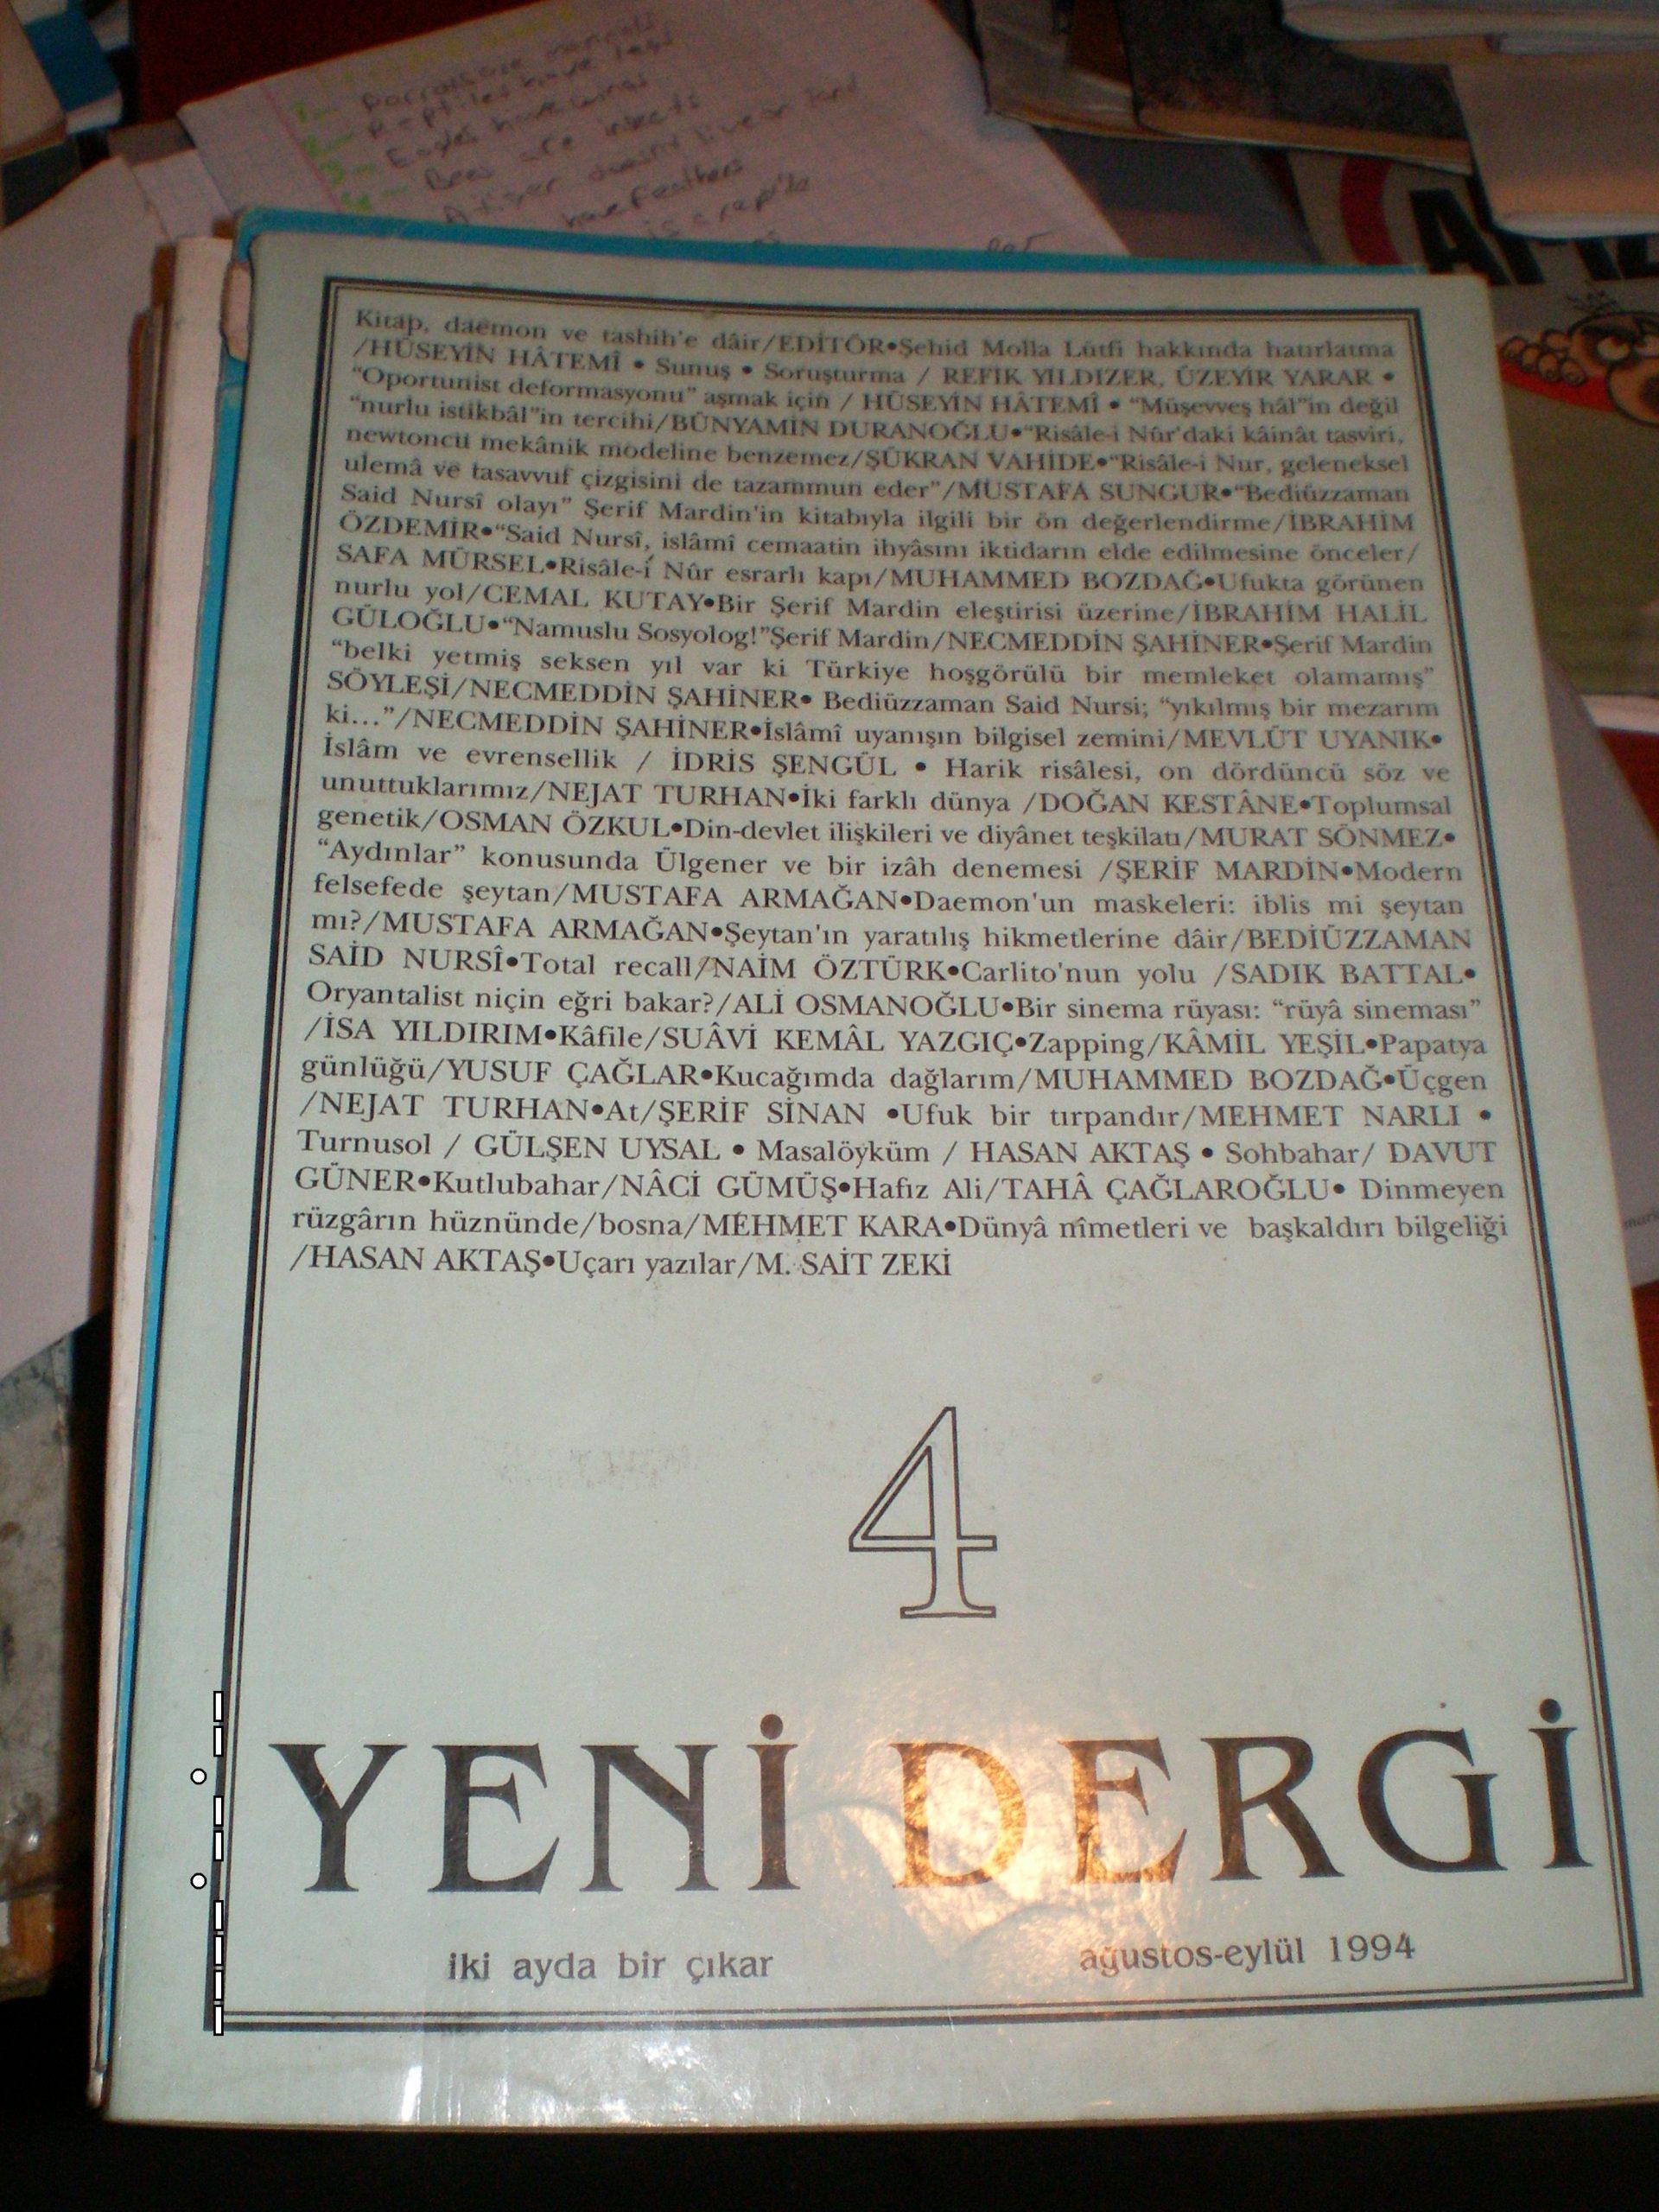 YENİ DERGİ-Sayı 4-1994/Said Nursi  üzerine/ 15tl